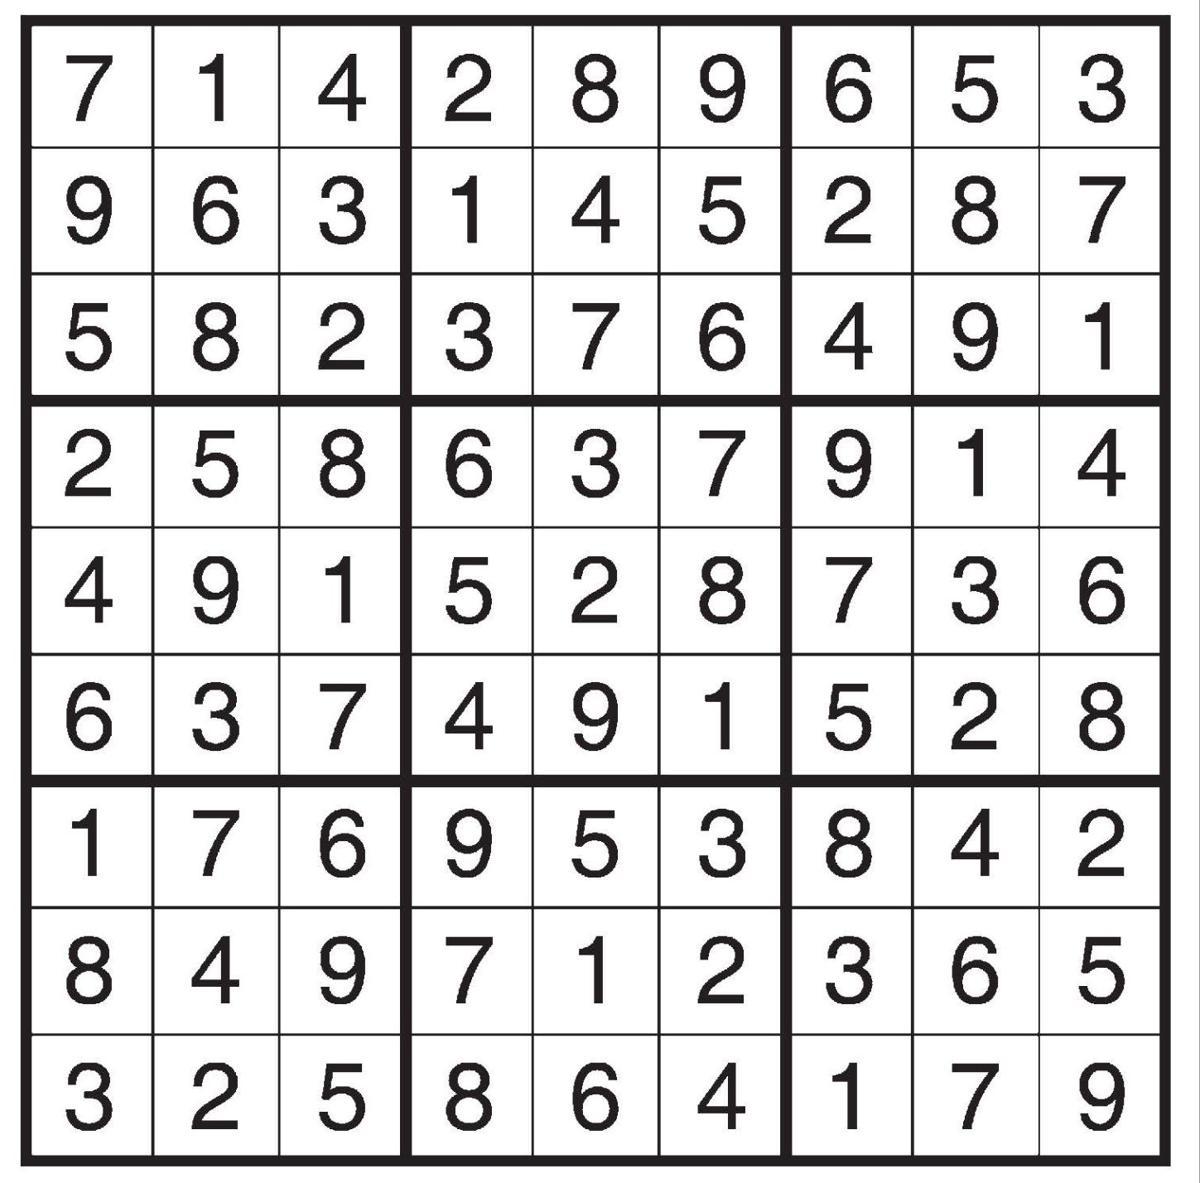 Sudoku 02-27-17